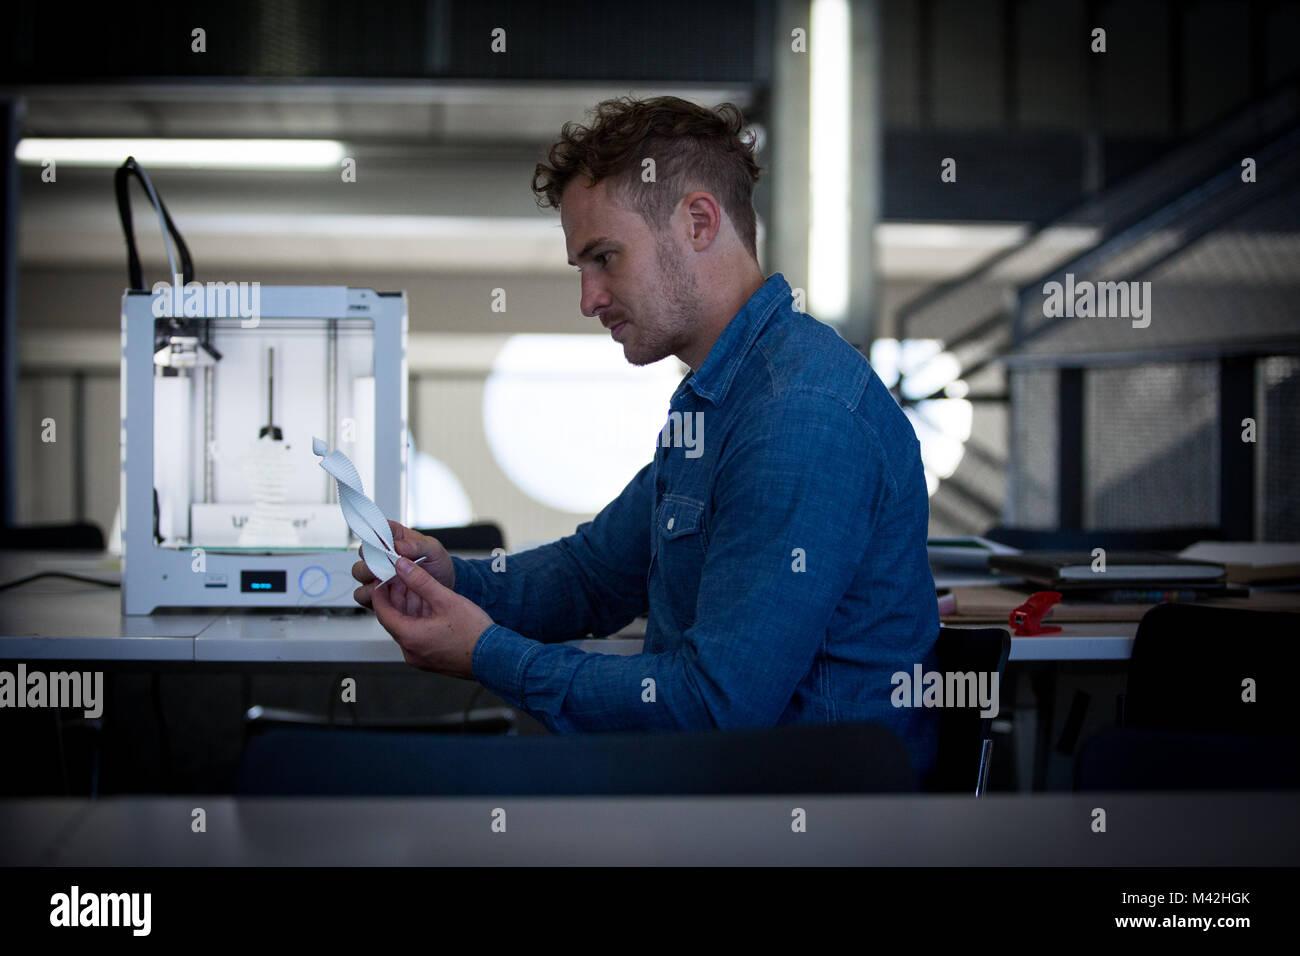 Designer with 3D printer - Stock Image